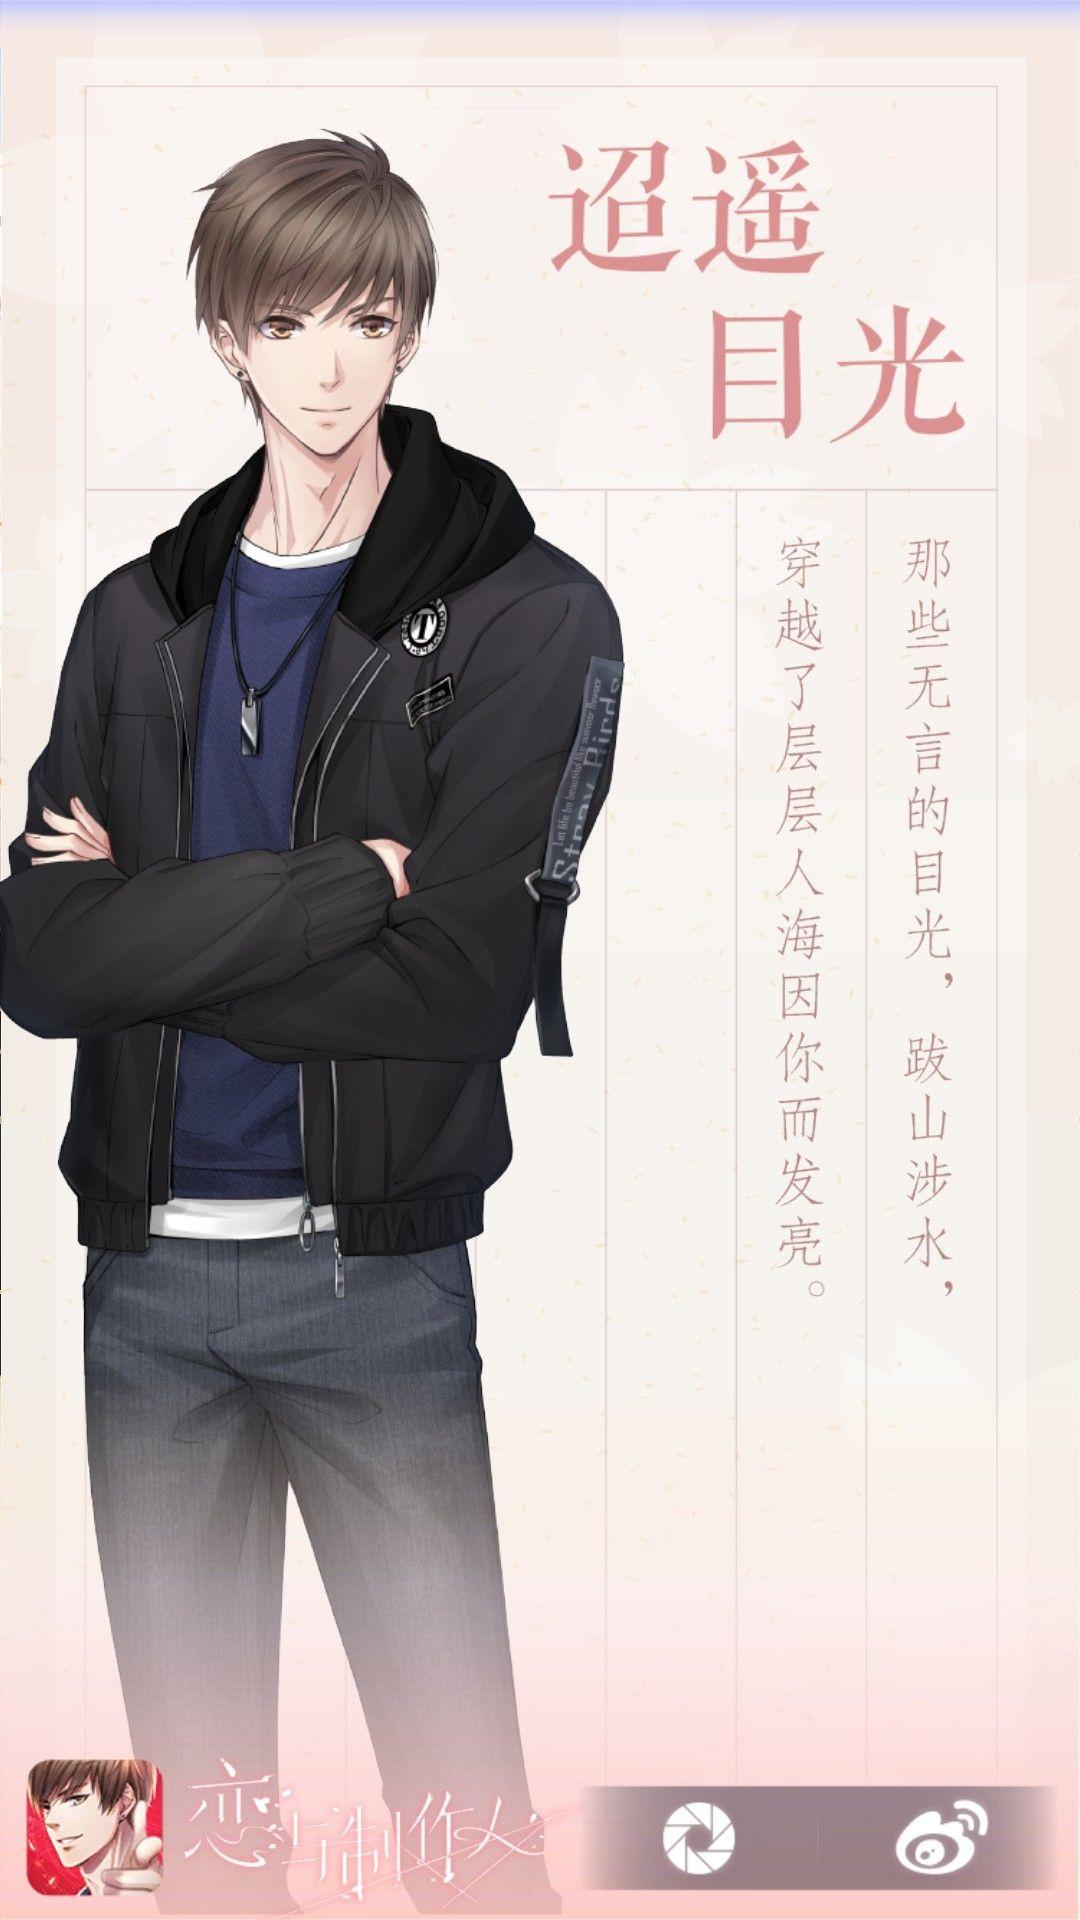 Pin oleh 姿毓 彭 di Anime Fantasy Lovers Anime cowok ganteng